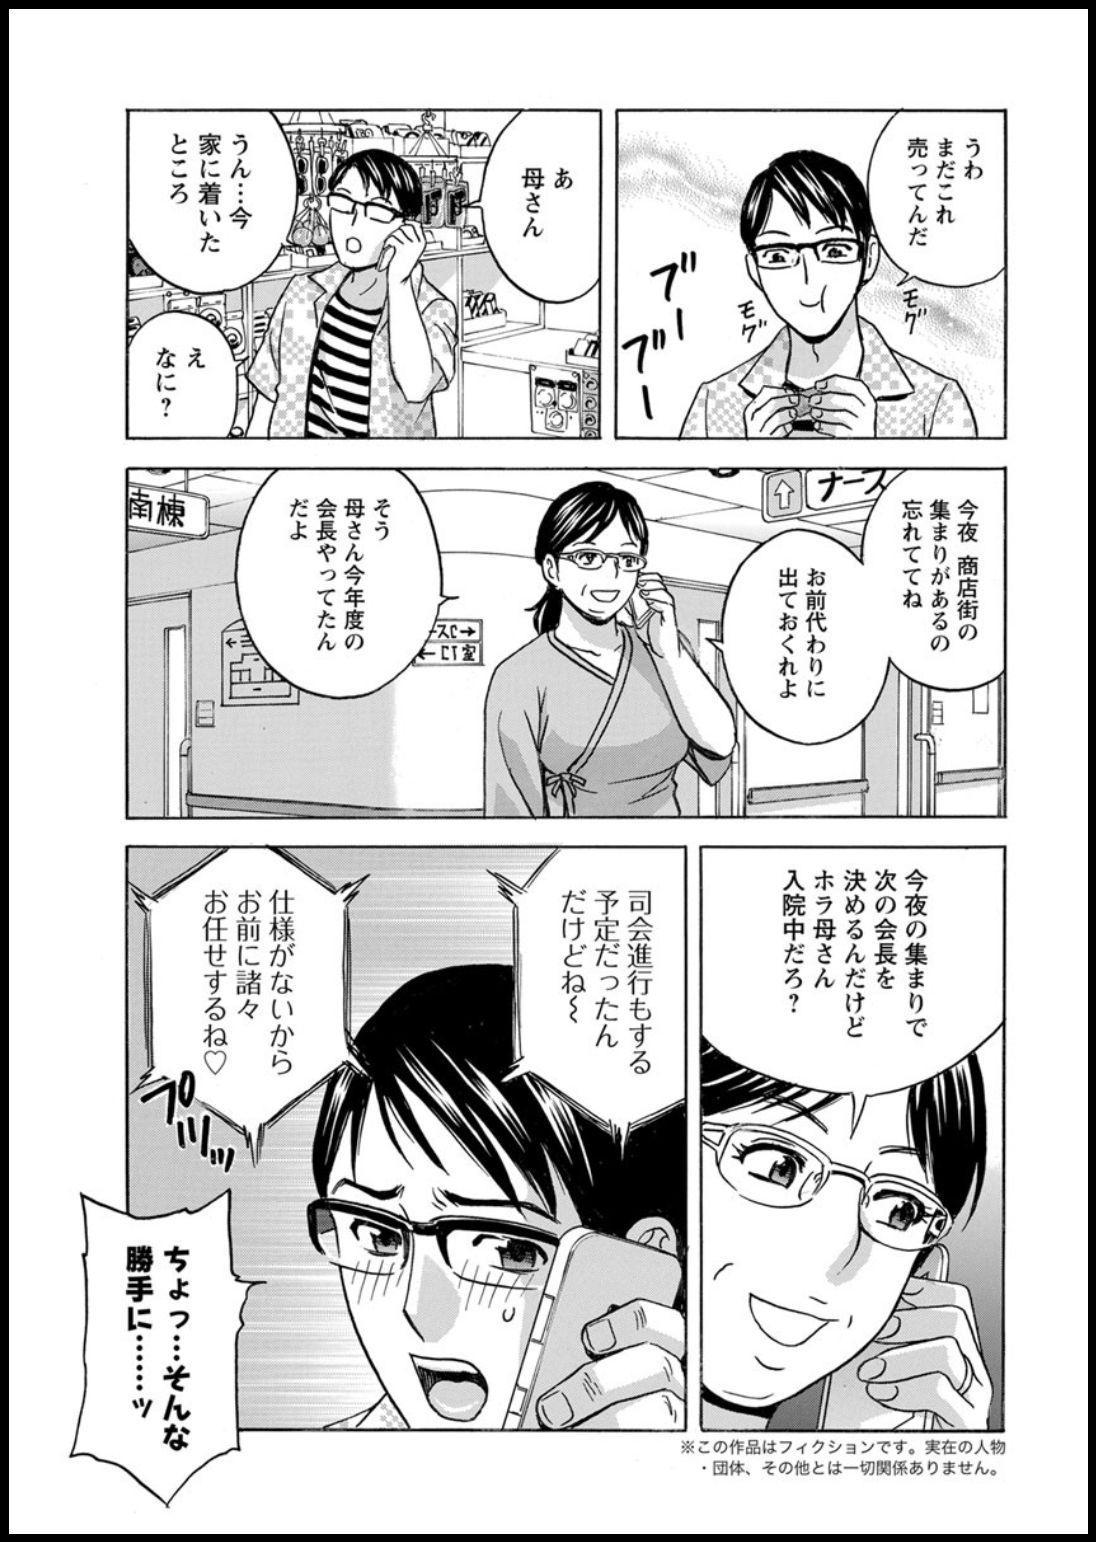 [Hidemaru] Yurase Bikyonyuu! Hataraku J-Cup Ch. 1-5 [Digital] 6